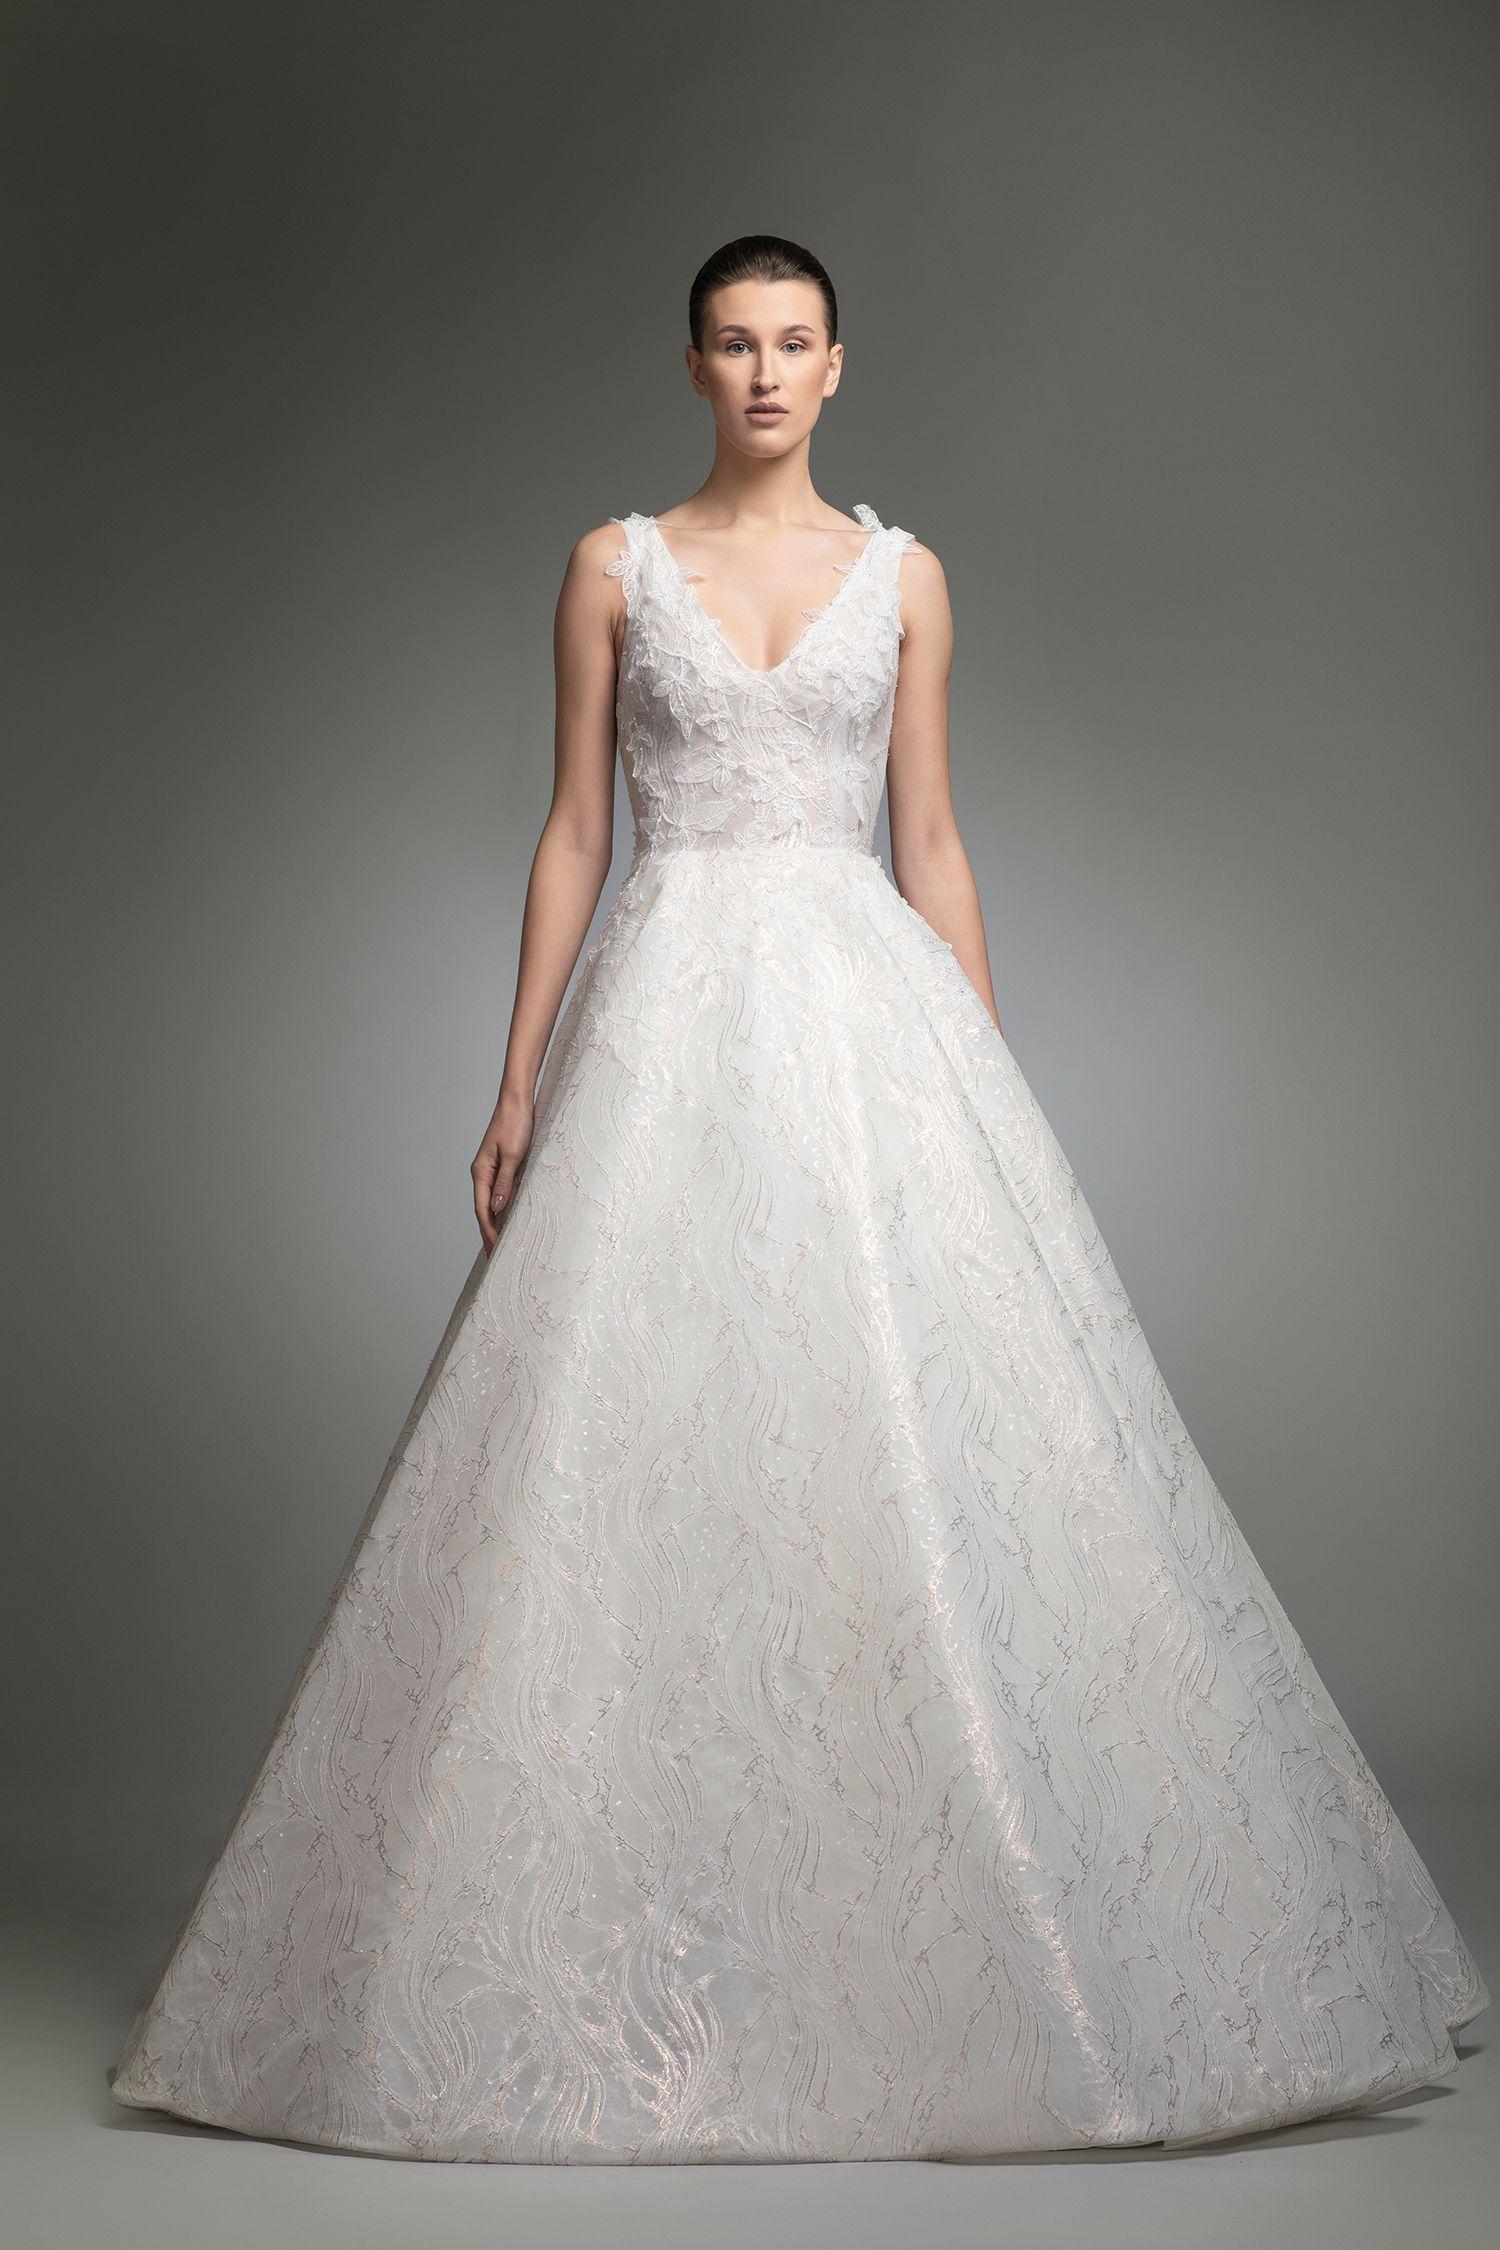 Yerevan Wedding Dresses Wedding Dress Boutiques A Line Bridal Gowns